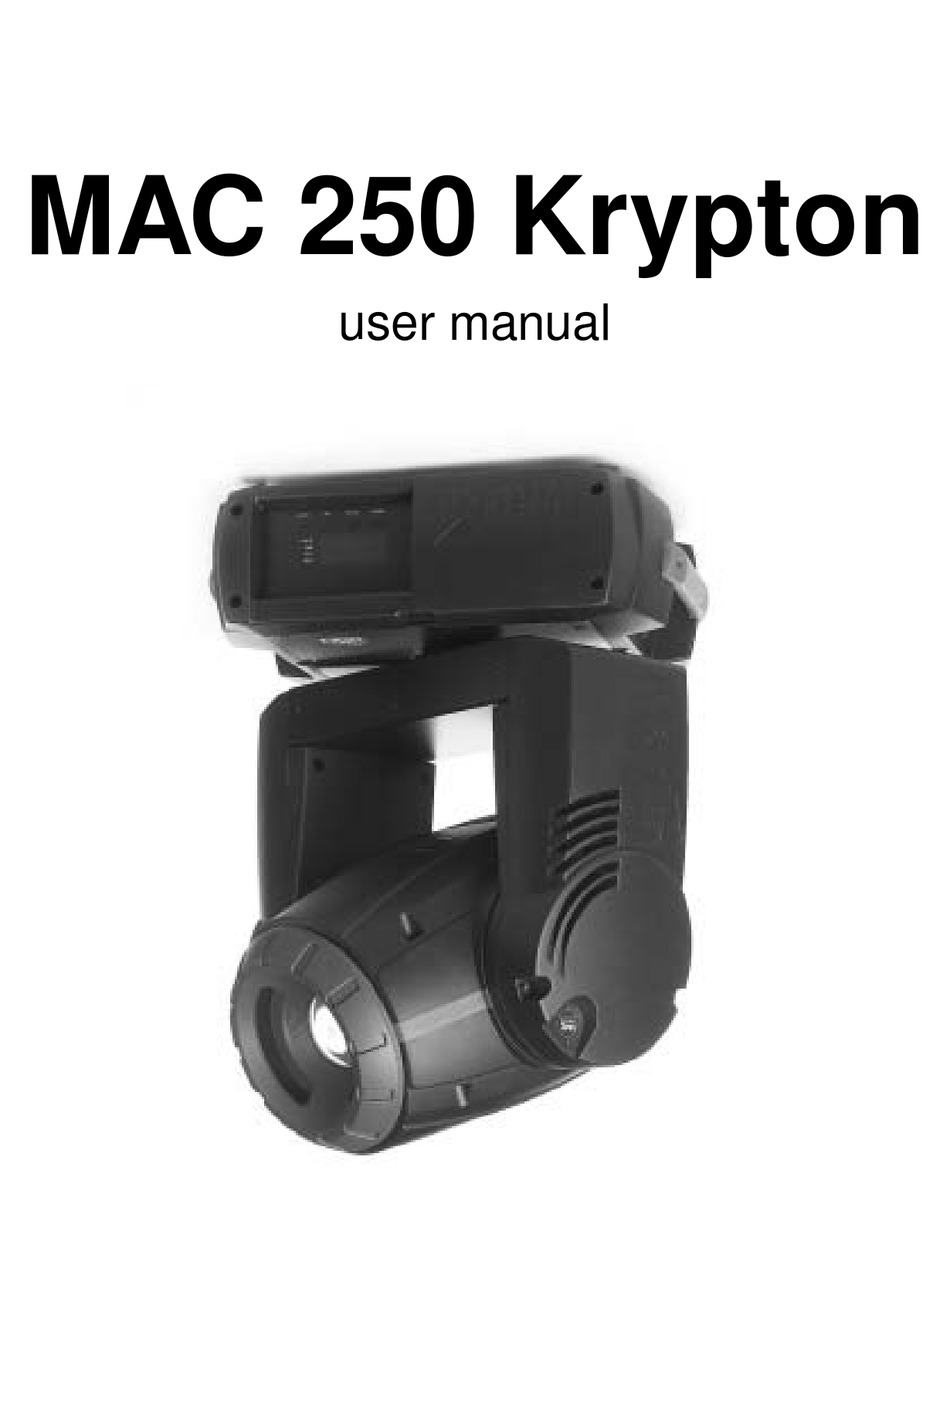 Martin Mac 250 Krypton Manual